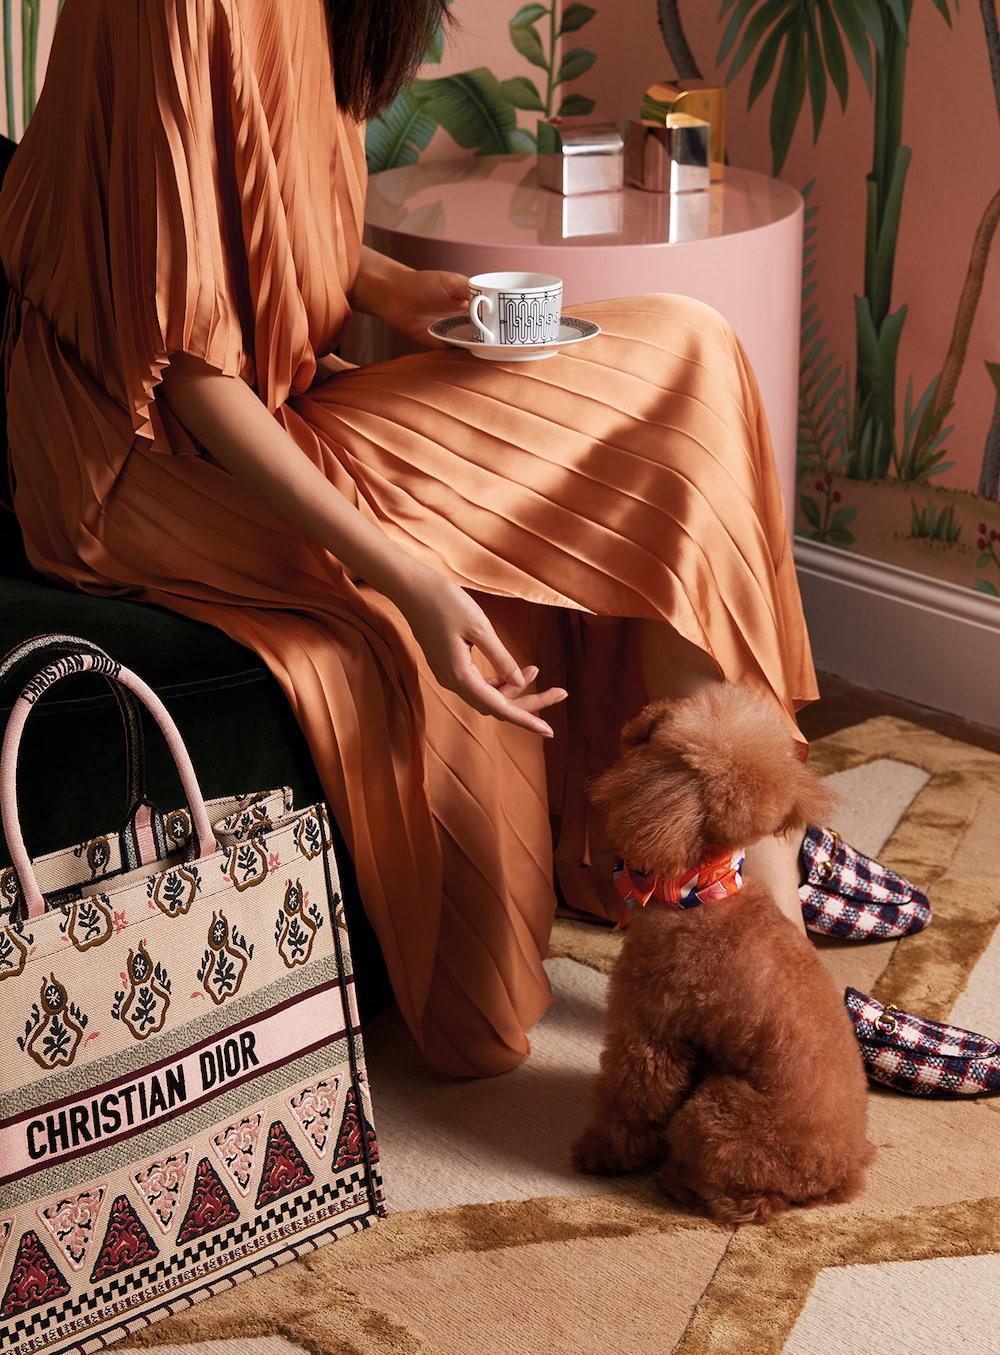 The geometric ornament makes this Christian Dior handbag incredibly beautiful